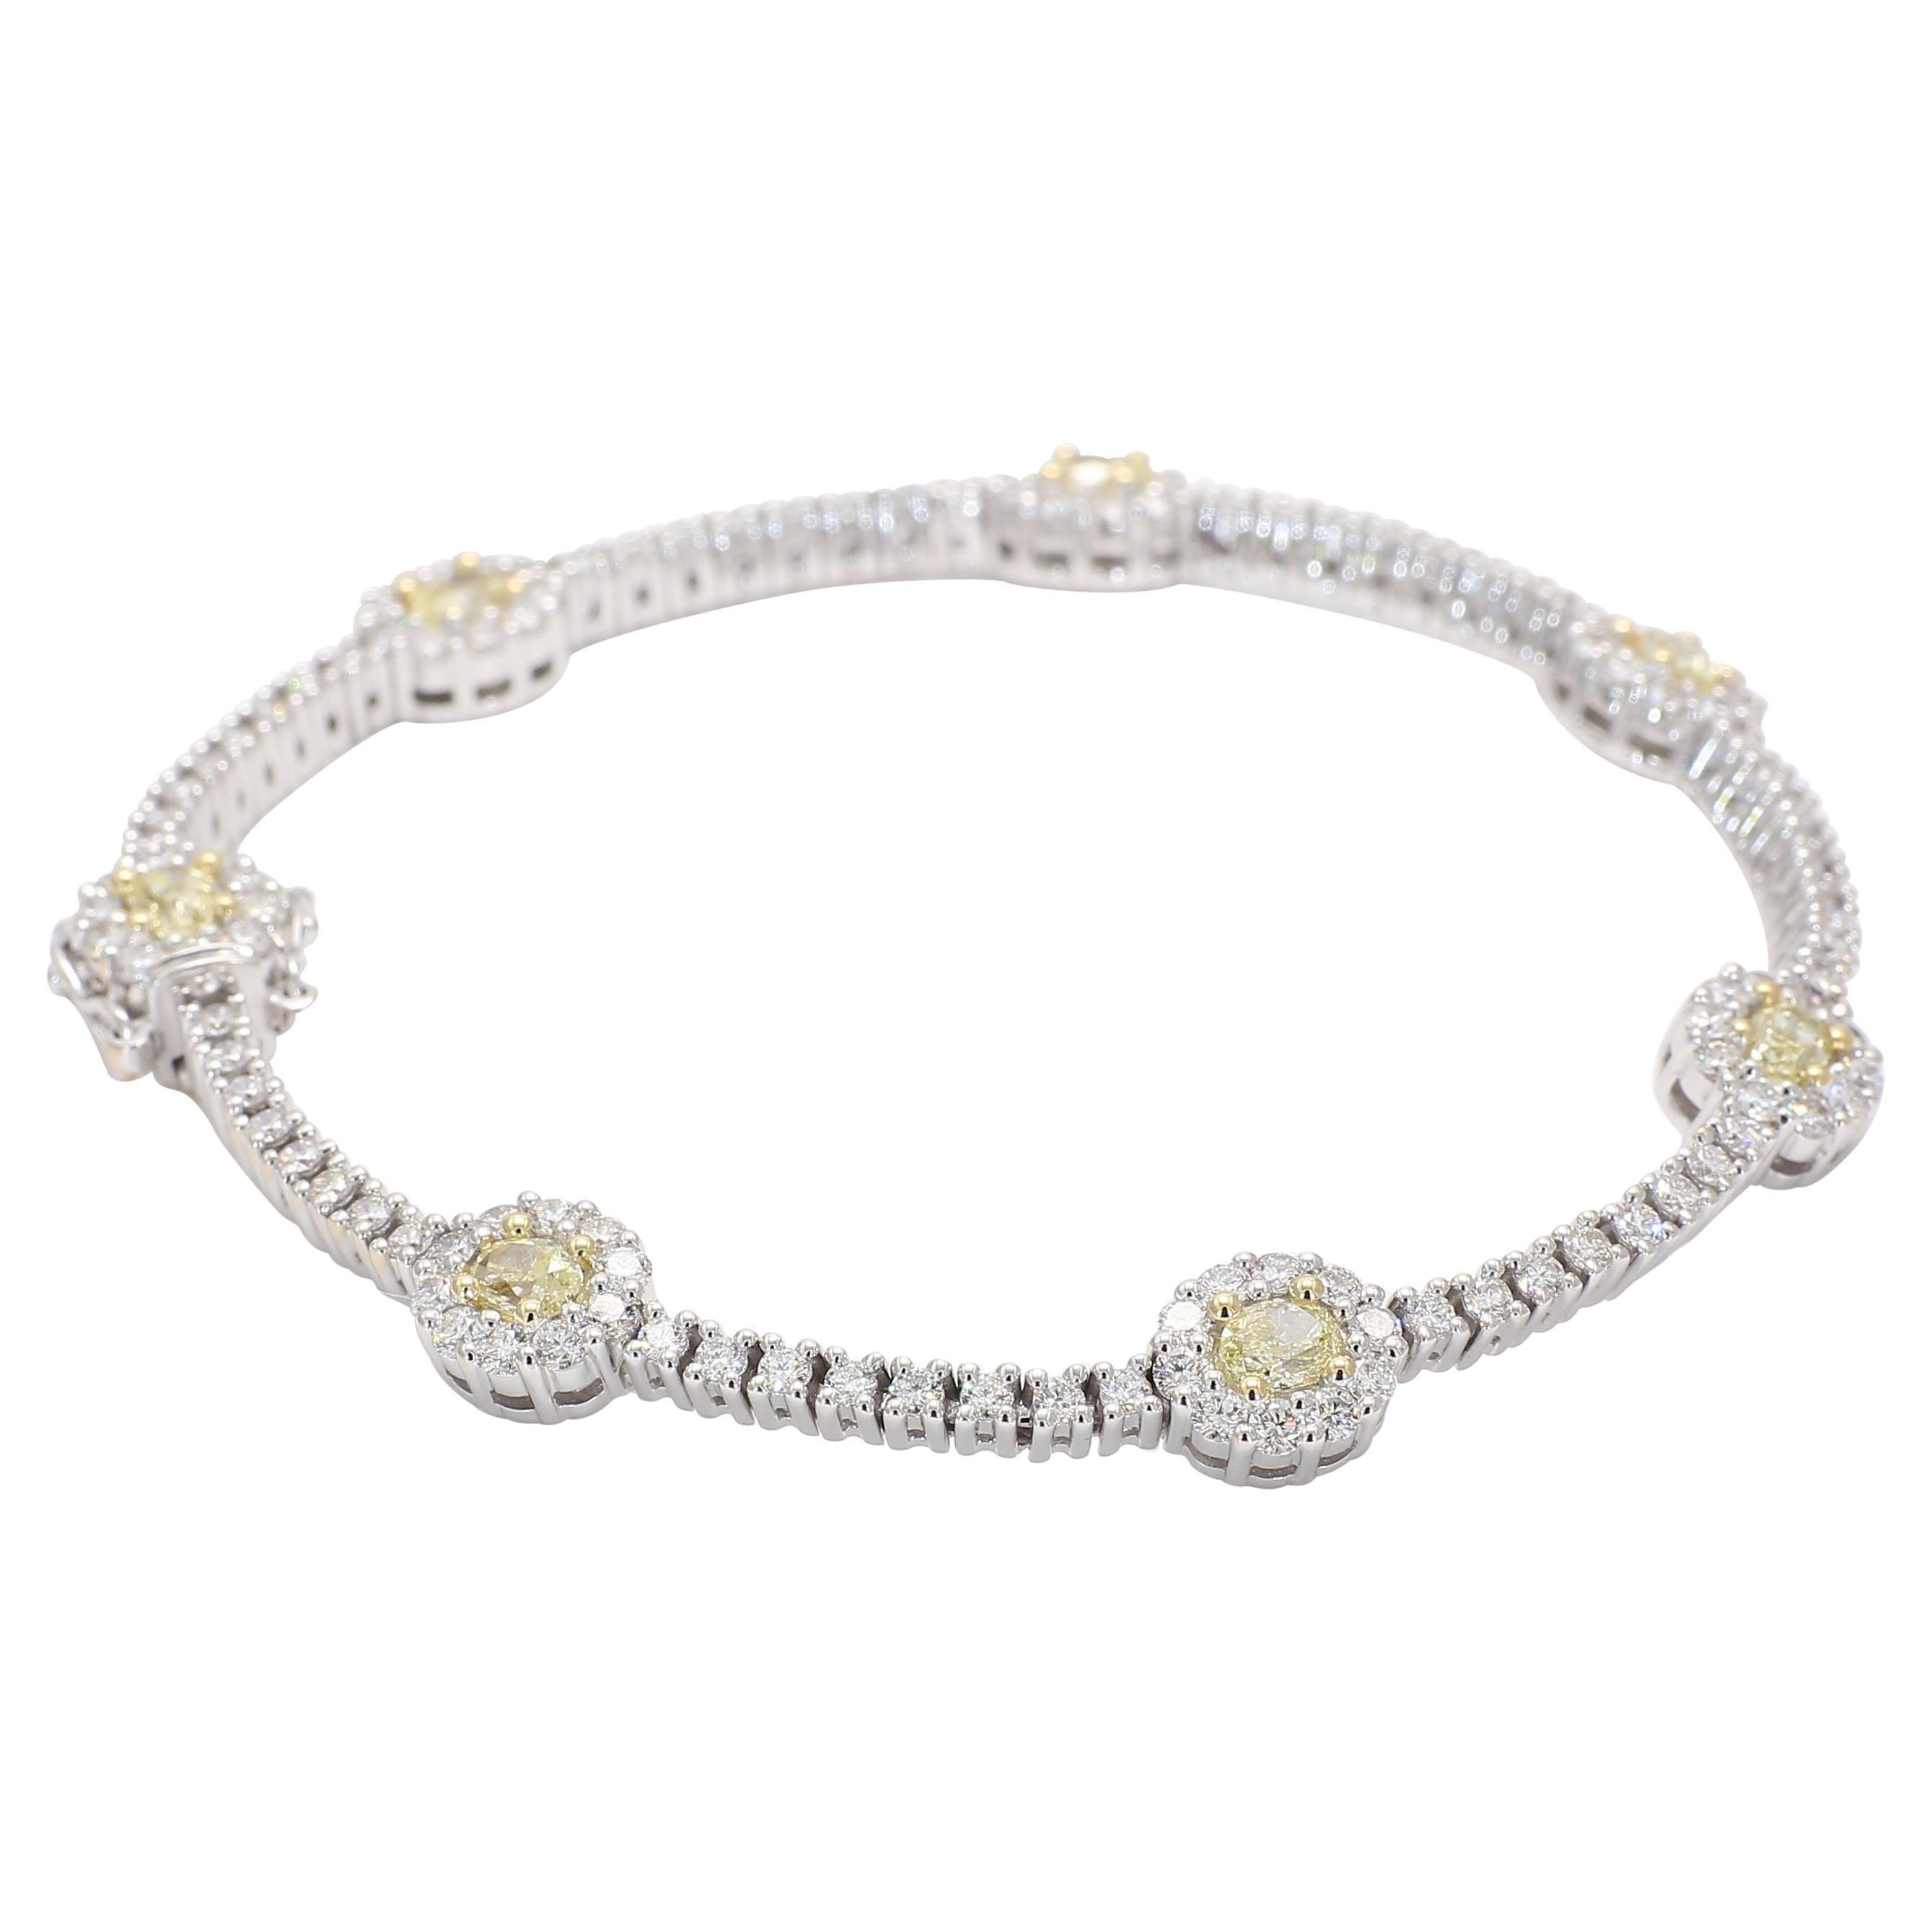 Natural Oval Yellow Diamond 4.85 Carat TW 18 Karat White Gold Bracelet